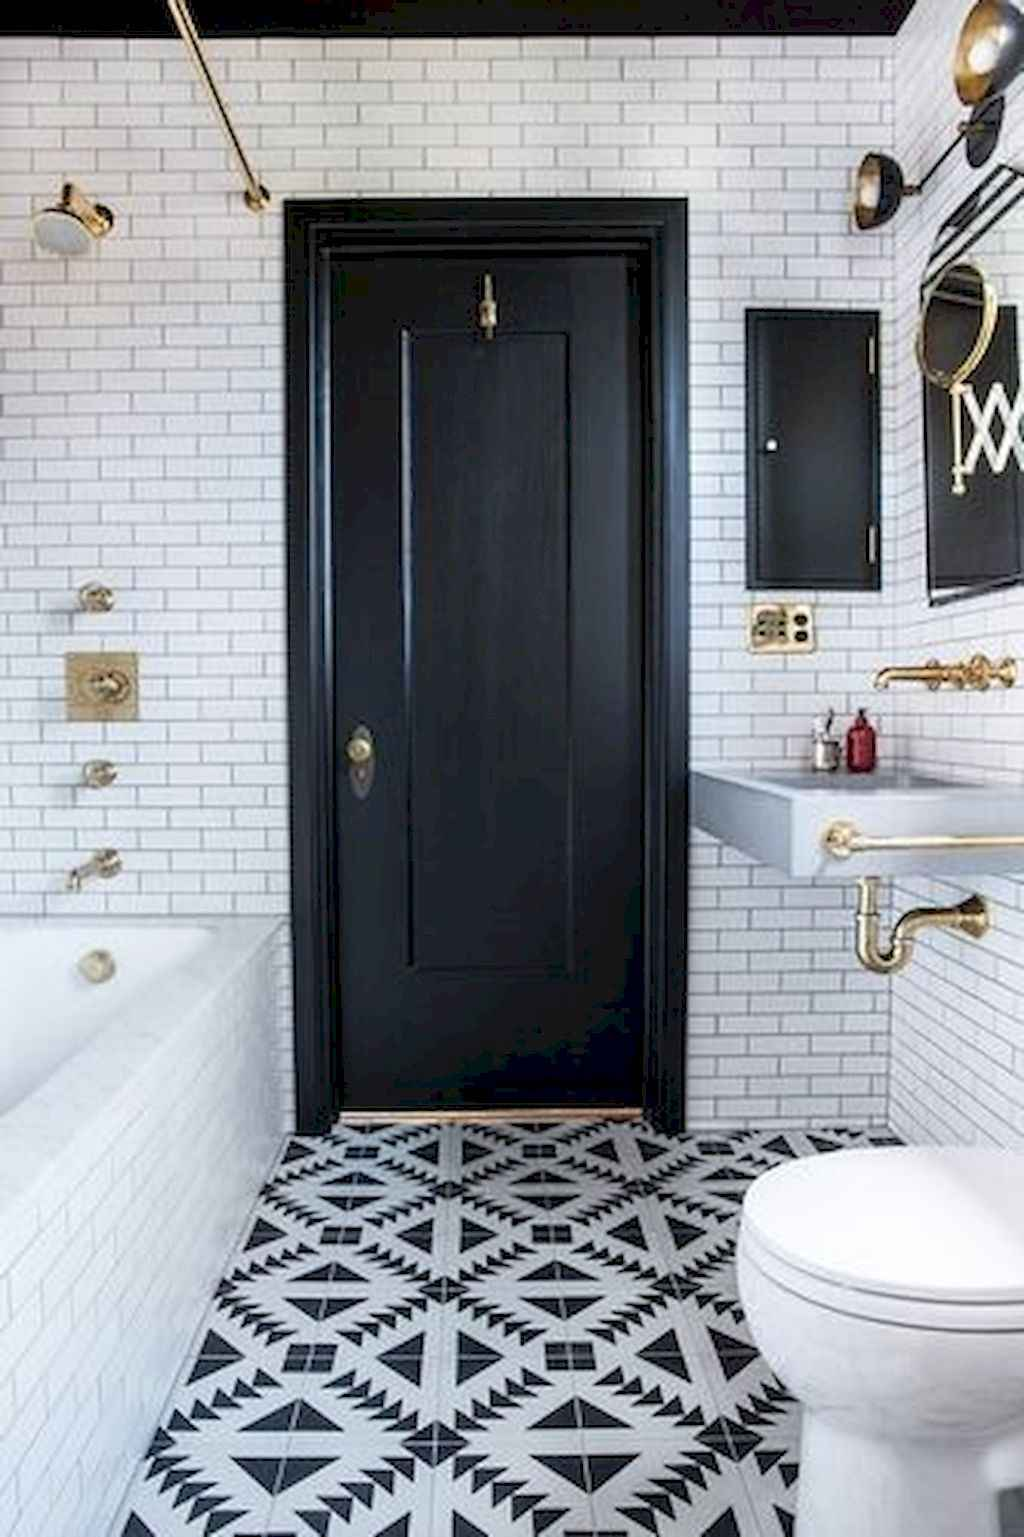 111 Brilliant Small Bathroom Remodel Ideas On A Budget (46)